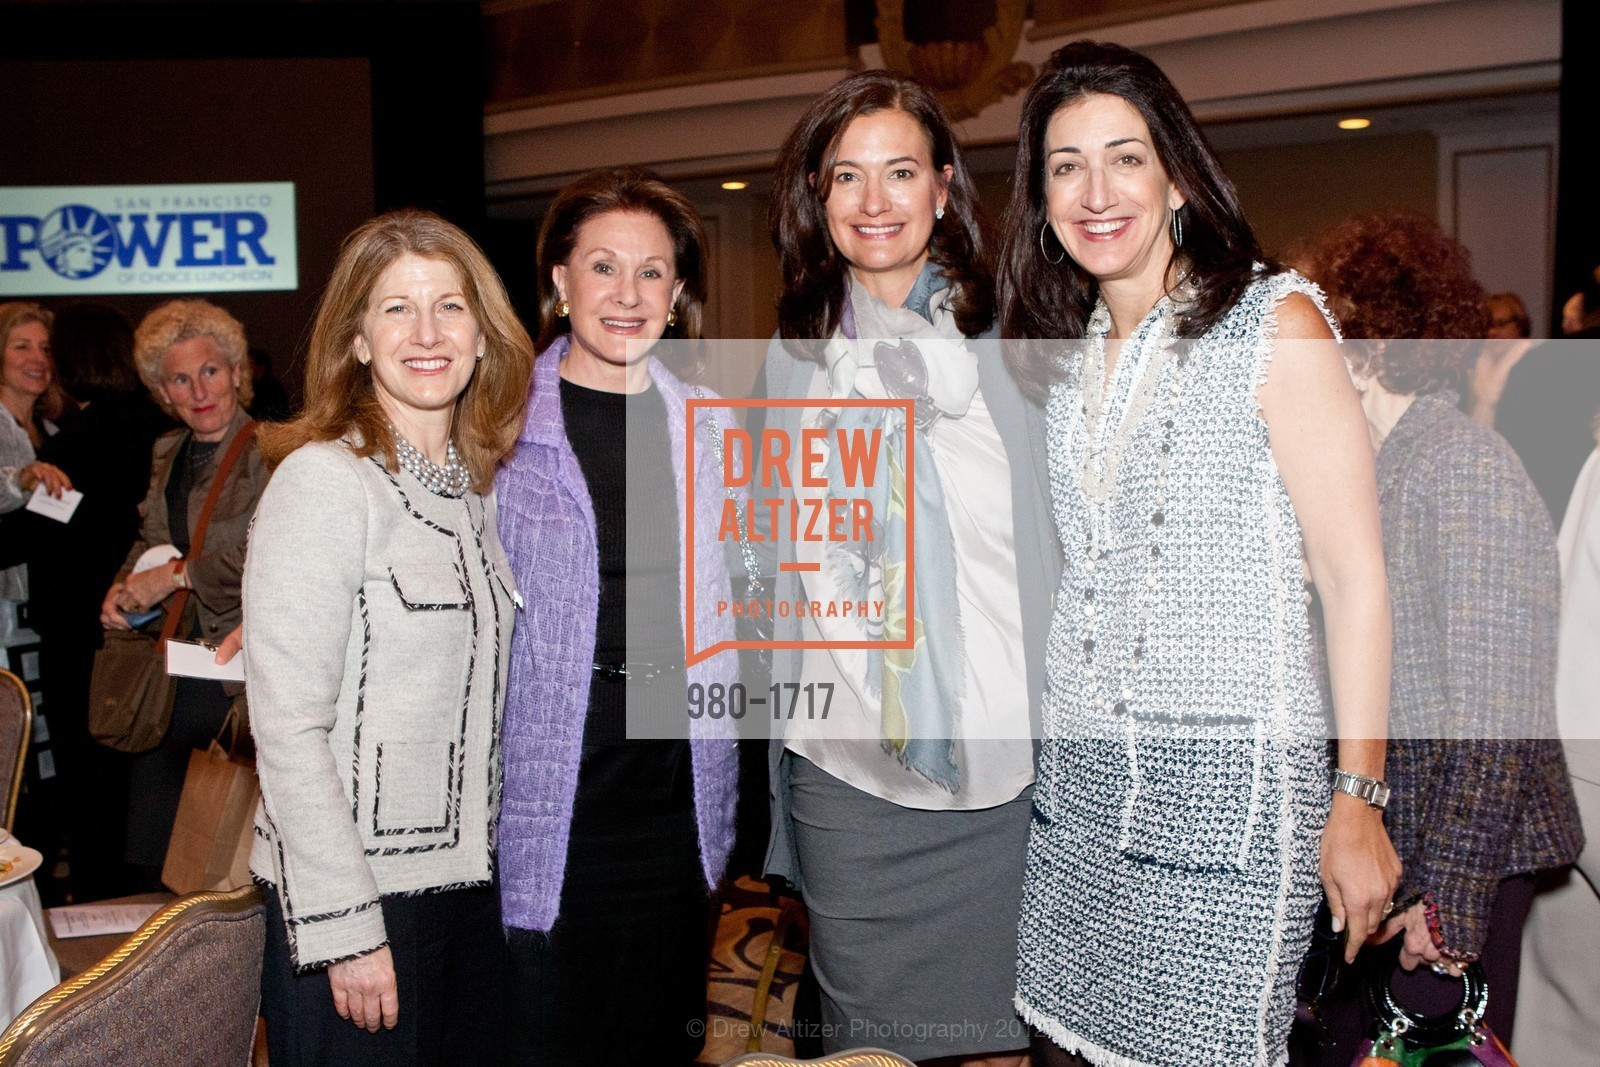 Diana Sansberg, Lucie Weissman, Angela Cohan, Pam Baer, Photo #980-1717